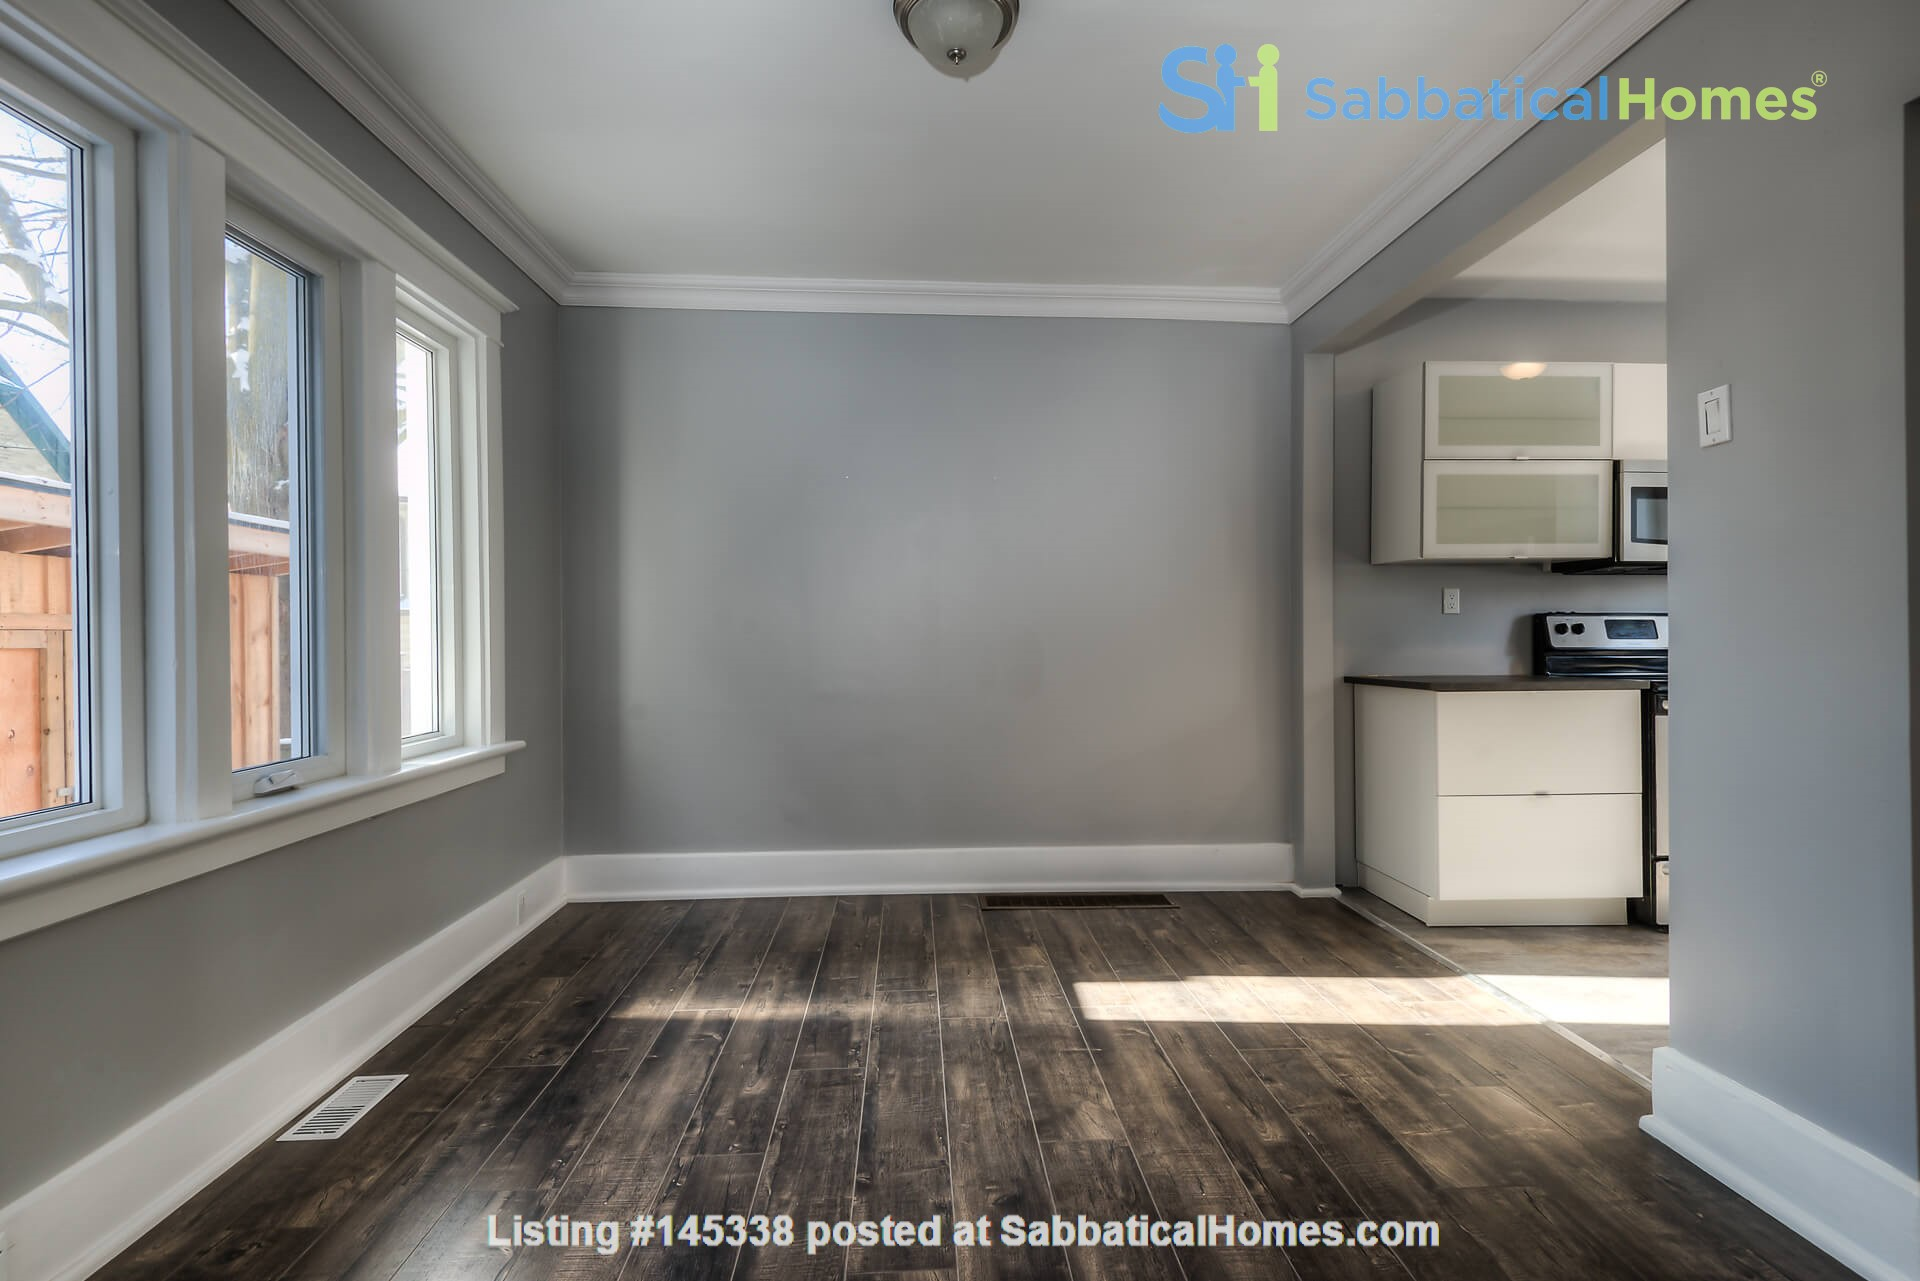 3 bdrm home (unfurnished) - downtown Kitchener-Waterloo Home Rental in Kitchener, Ontario, Canada 3